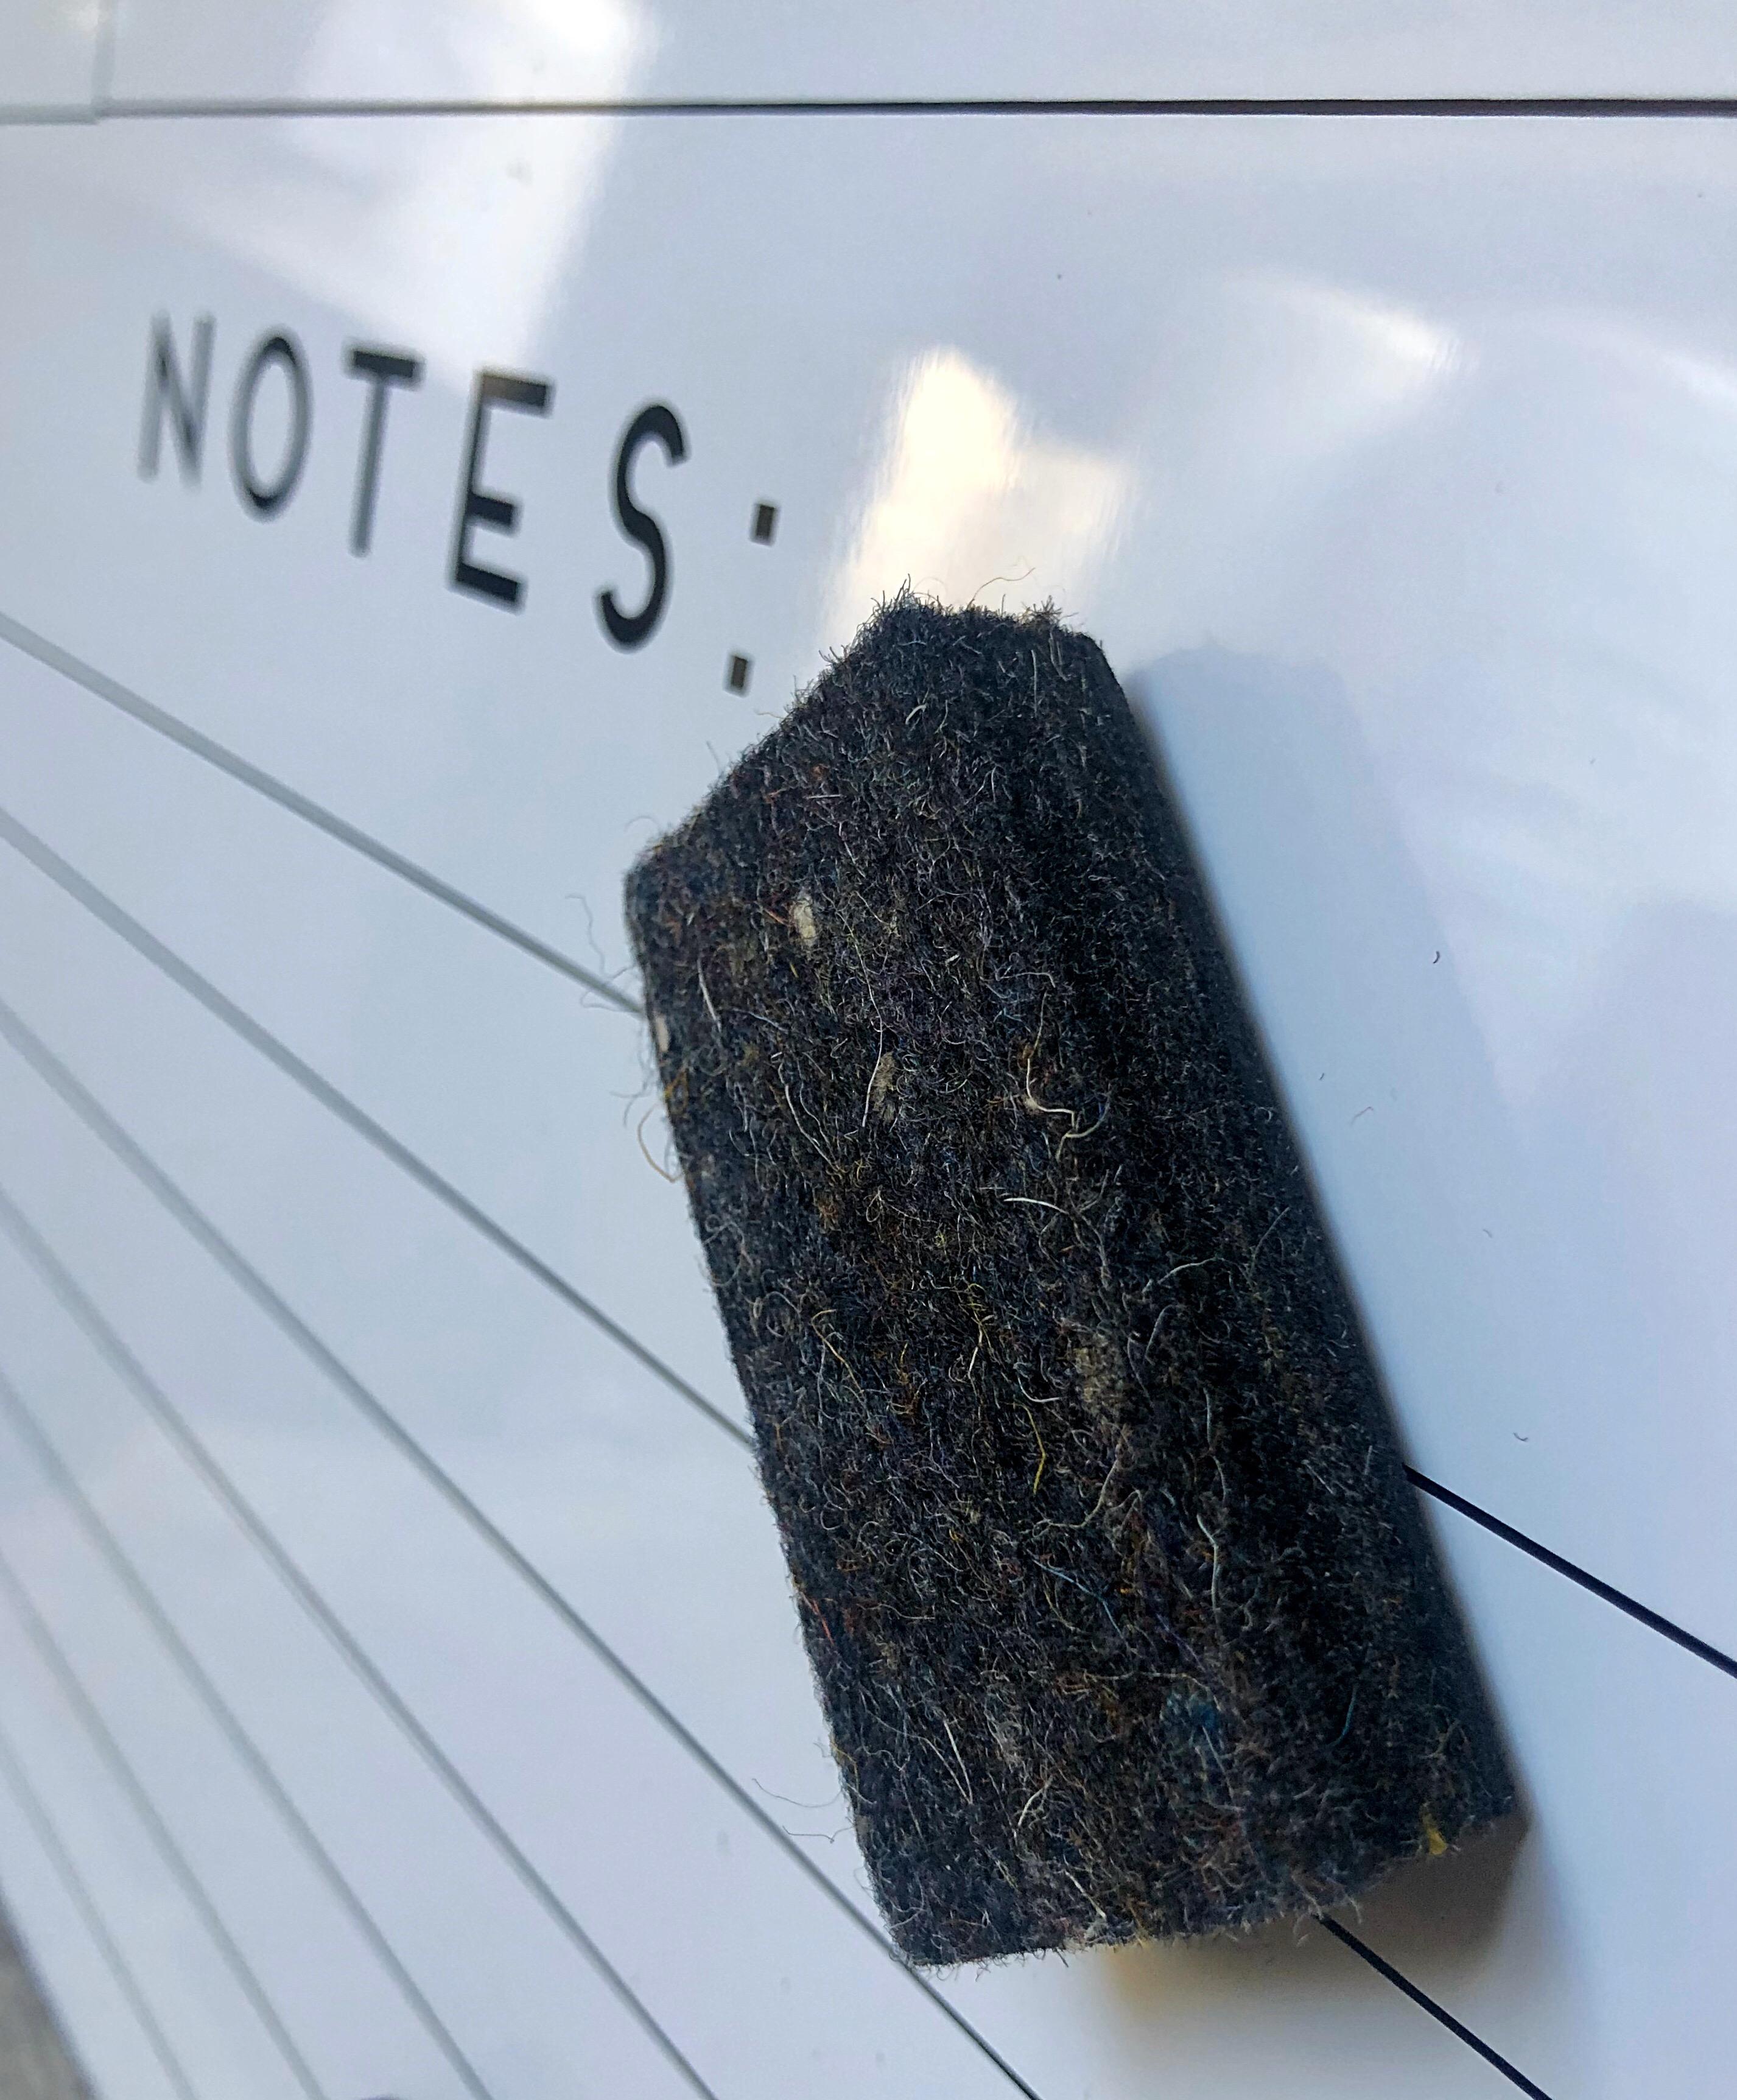 Magnetic Whiteboard Eraser Bulk Pack for School Office Training Supplies Mini Eraser Made in USA - Yola WhiteBoard | szyola.net